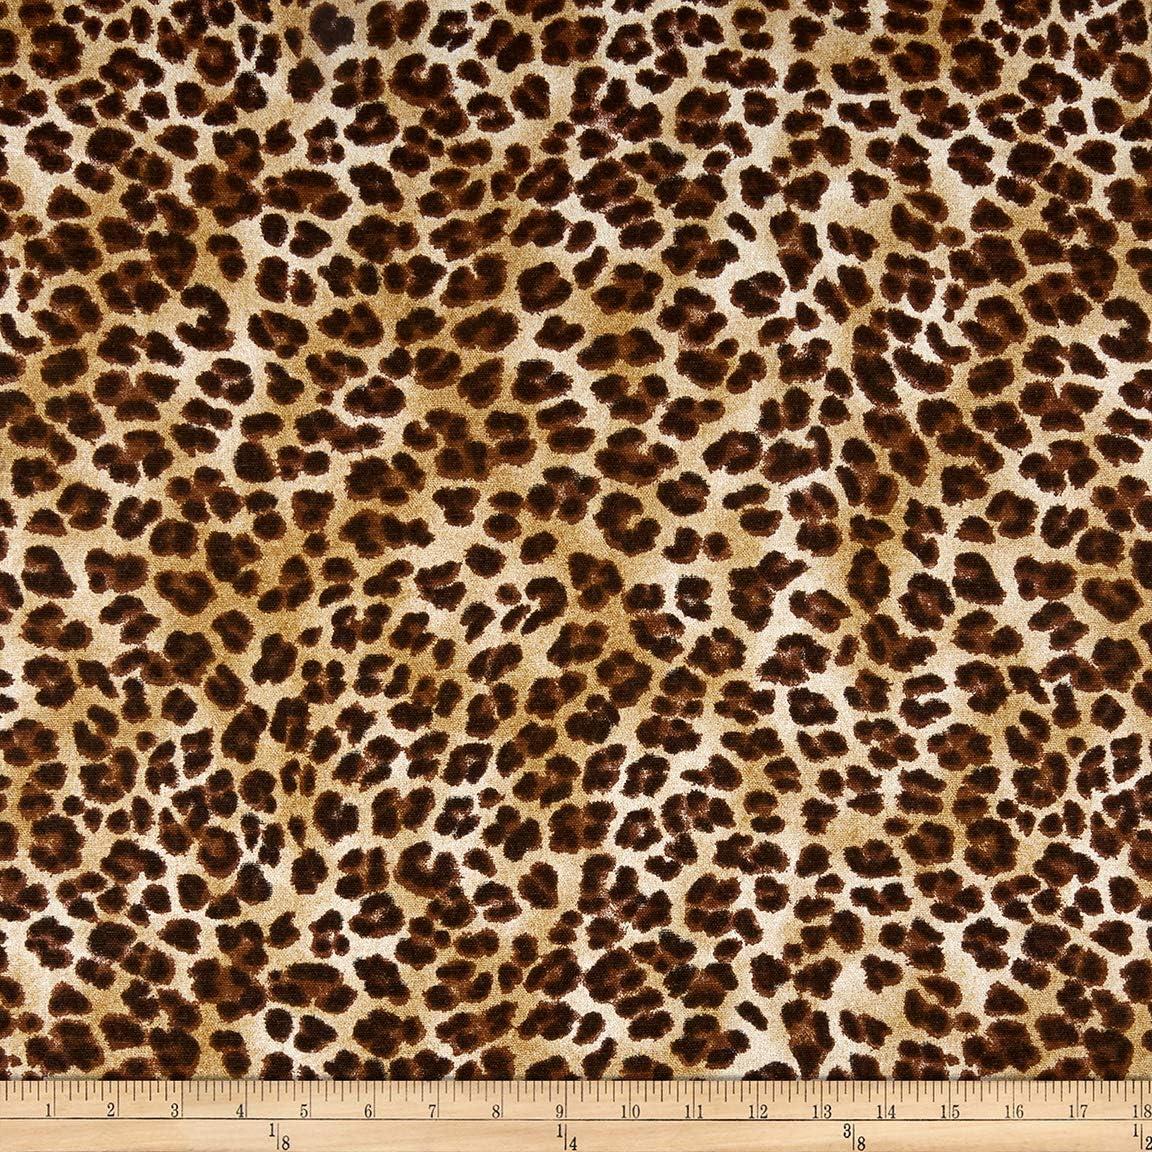 5.3 Y SHEER Leopard Print Fabric